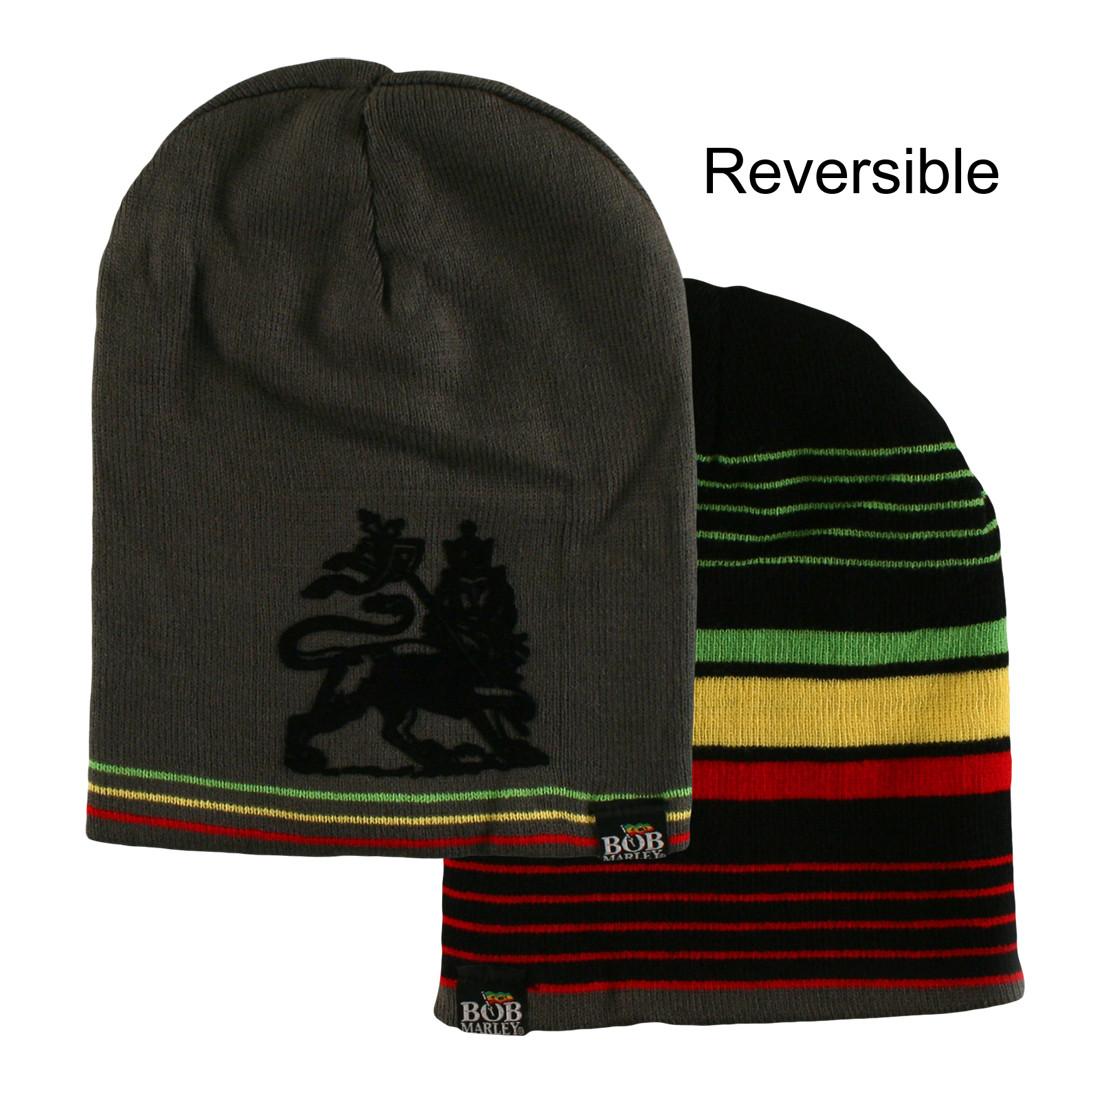 Marley Rasta Stripe Reversible Beanie